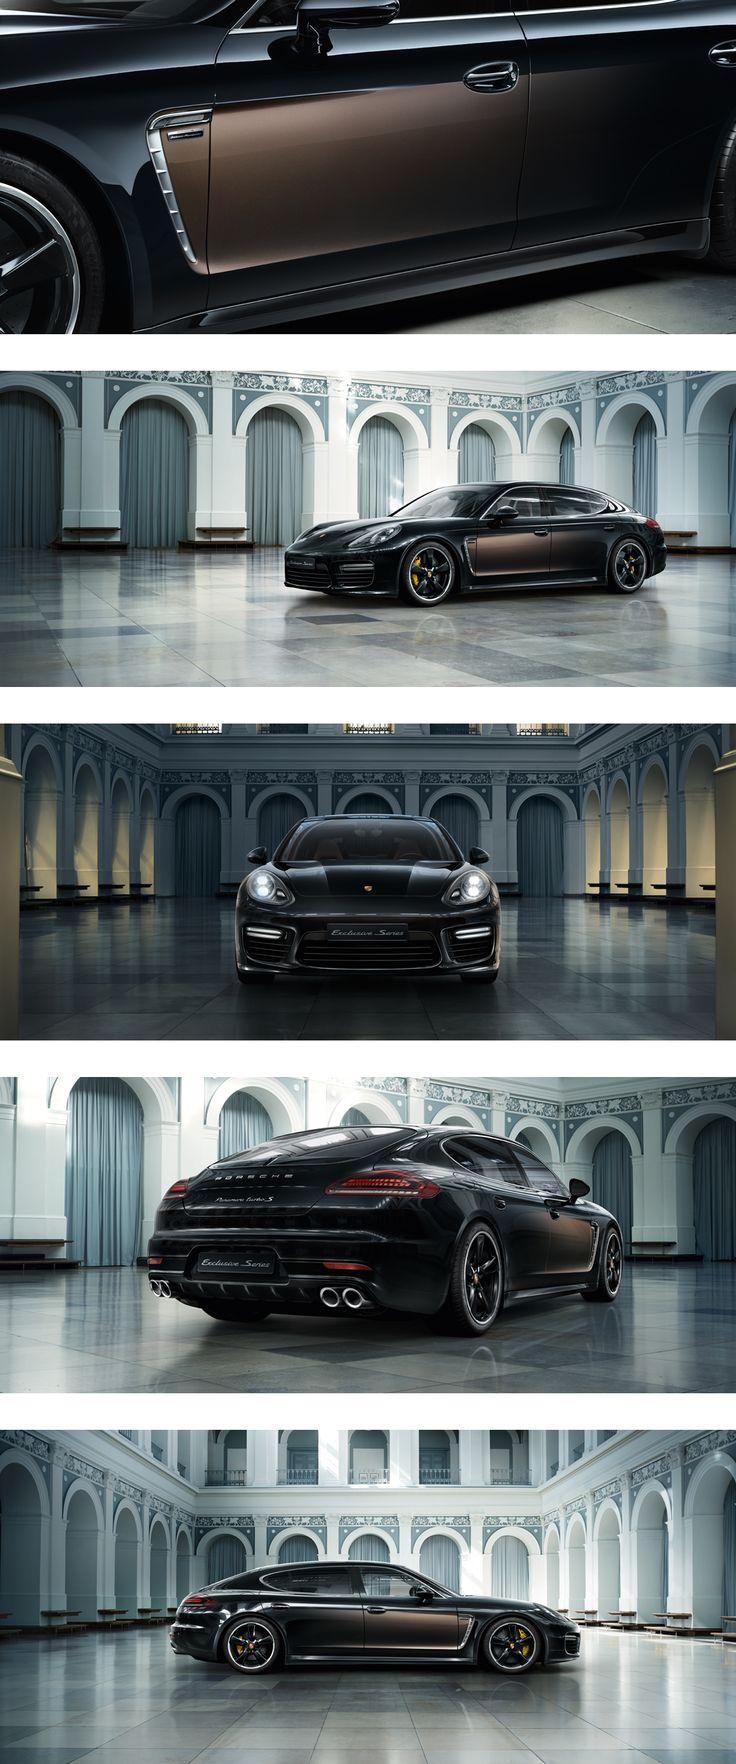 2015 Porsche Panamera Special Edition